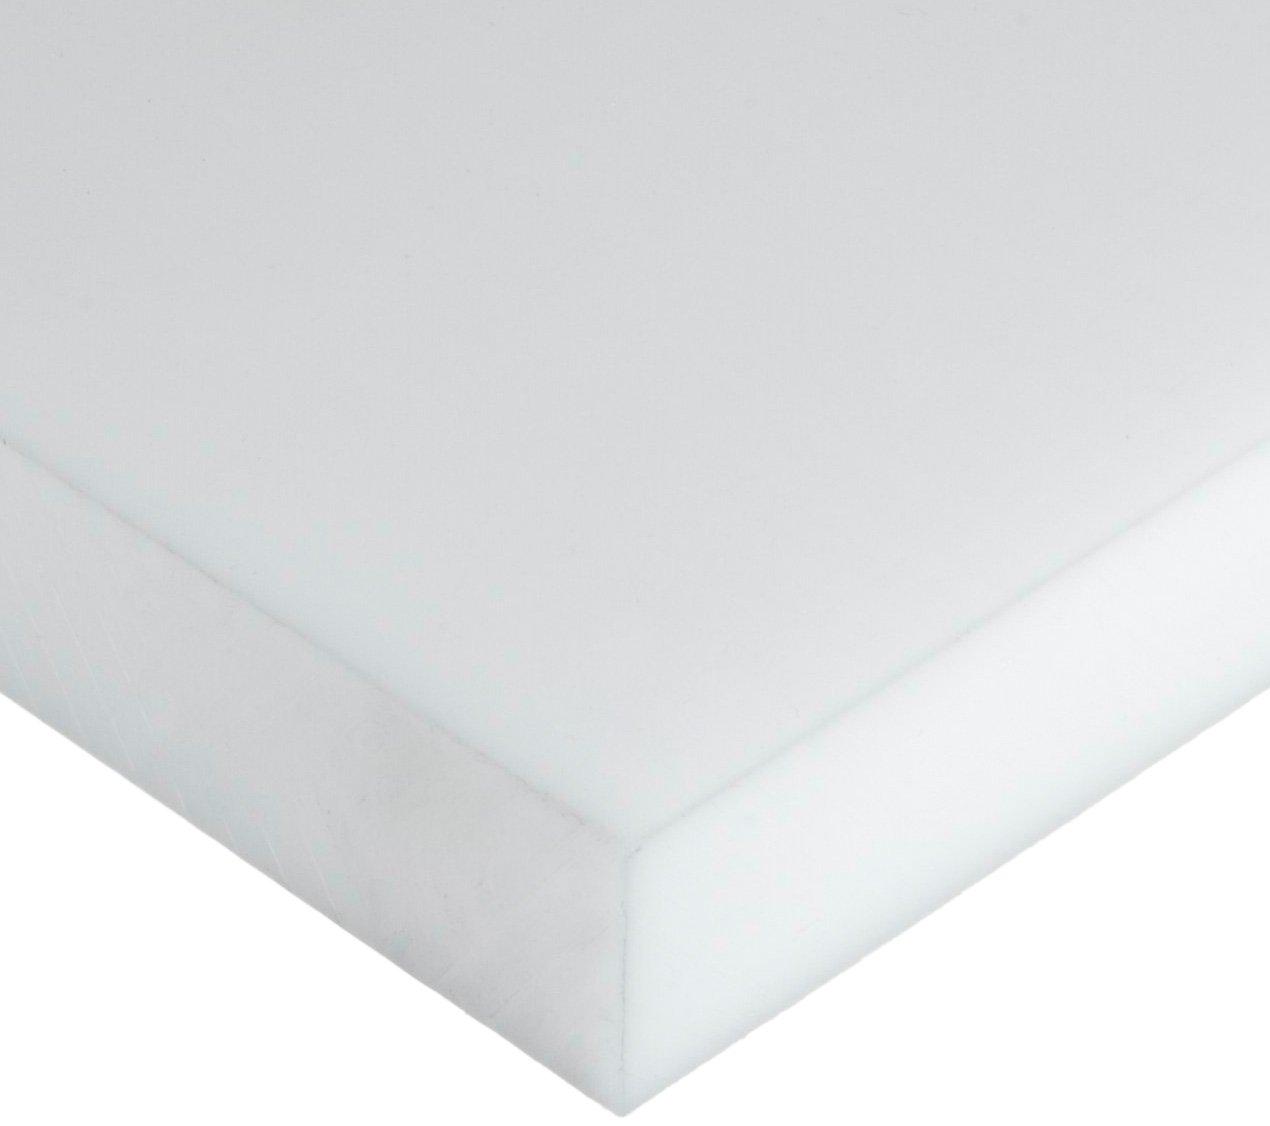 ASTM D6100//UL 94HB Opaque Off-White Acetal Copolymer Sheet Standard Tolerance